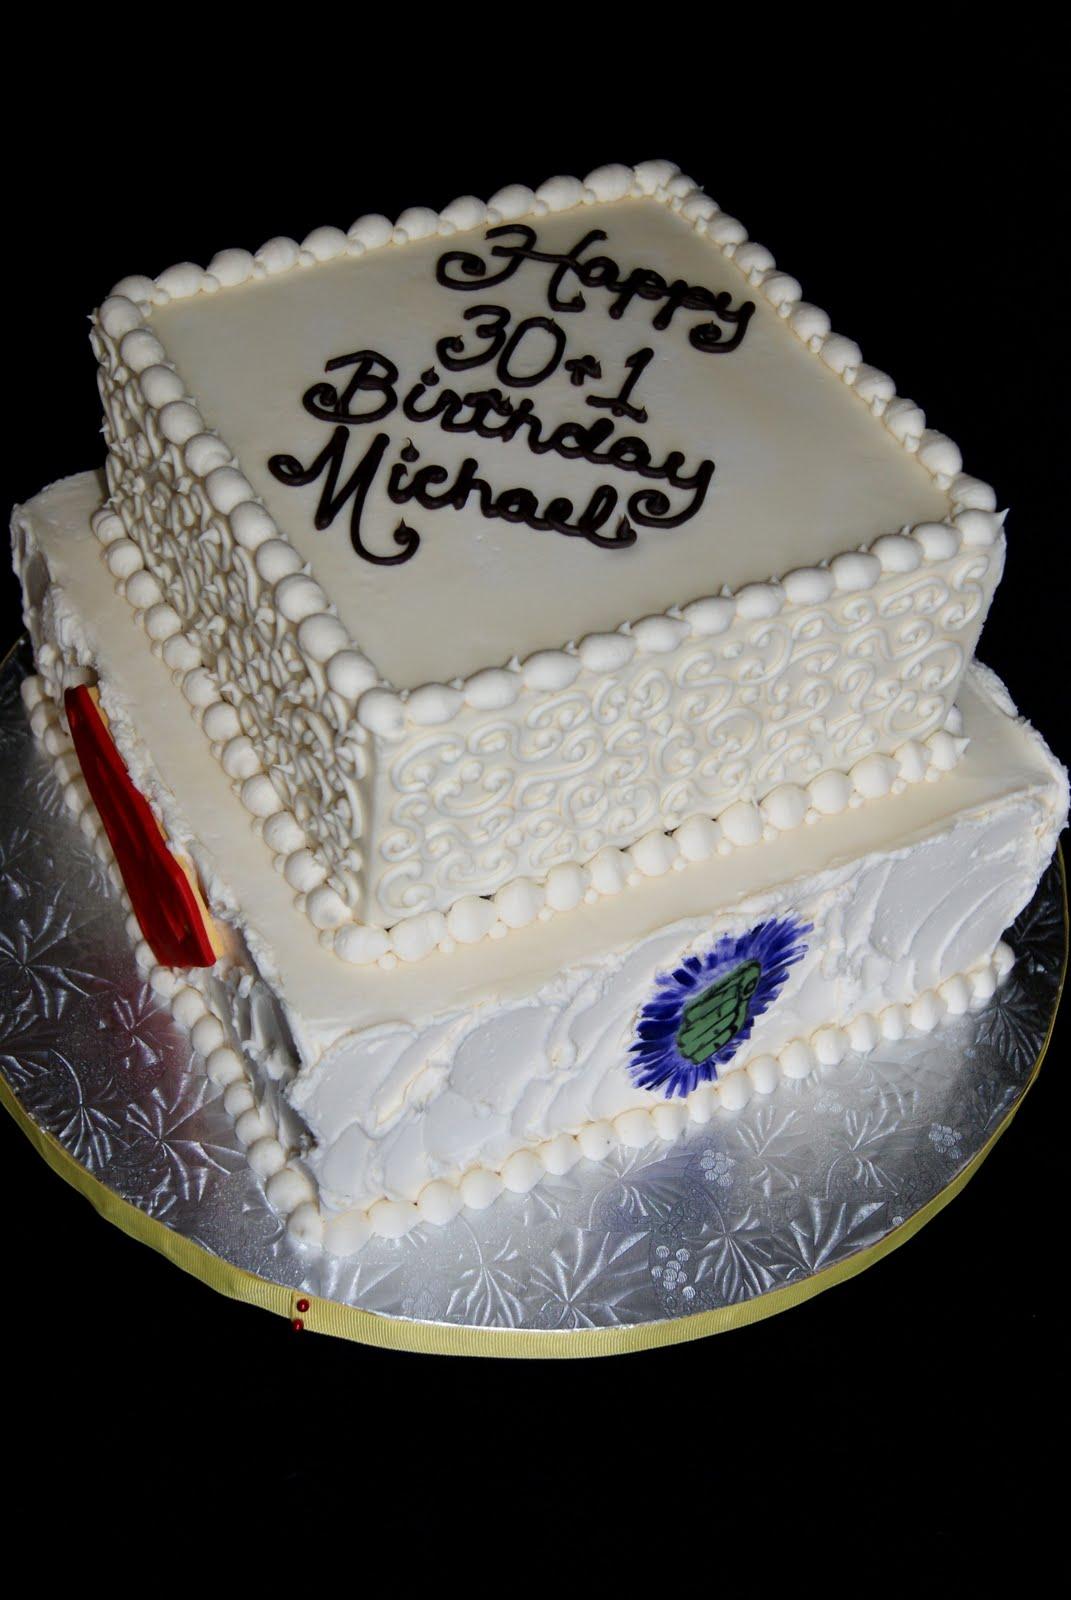 Happy Birthday Michael Cake Brithday Cake Brithday Cake Information